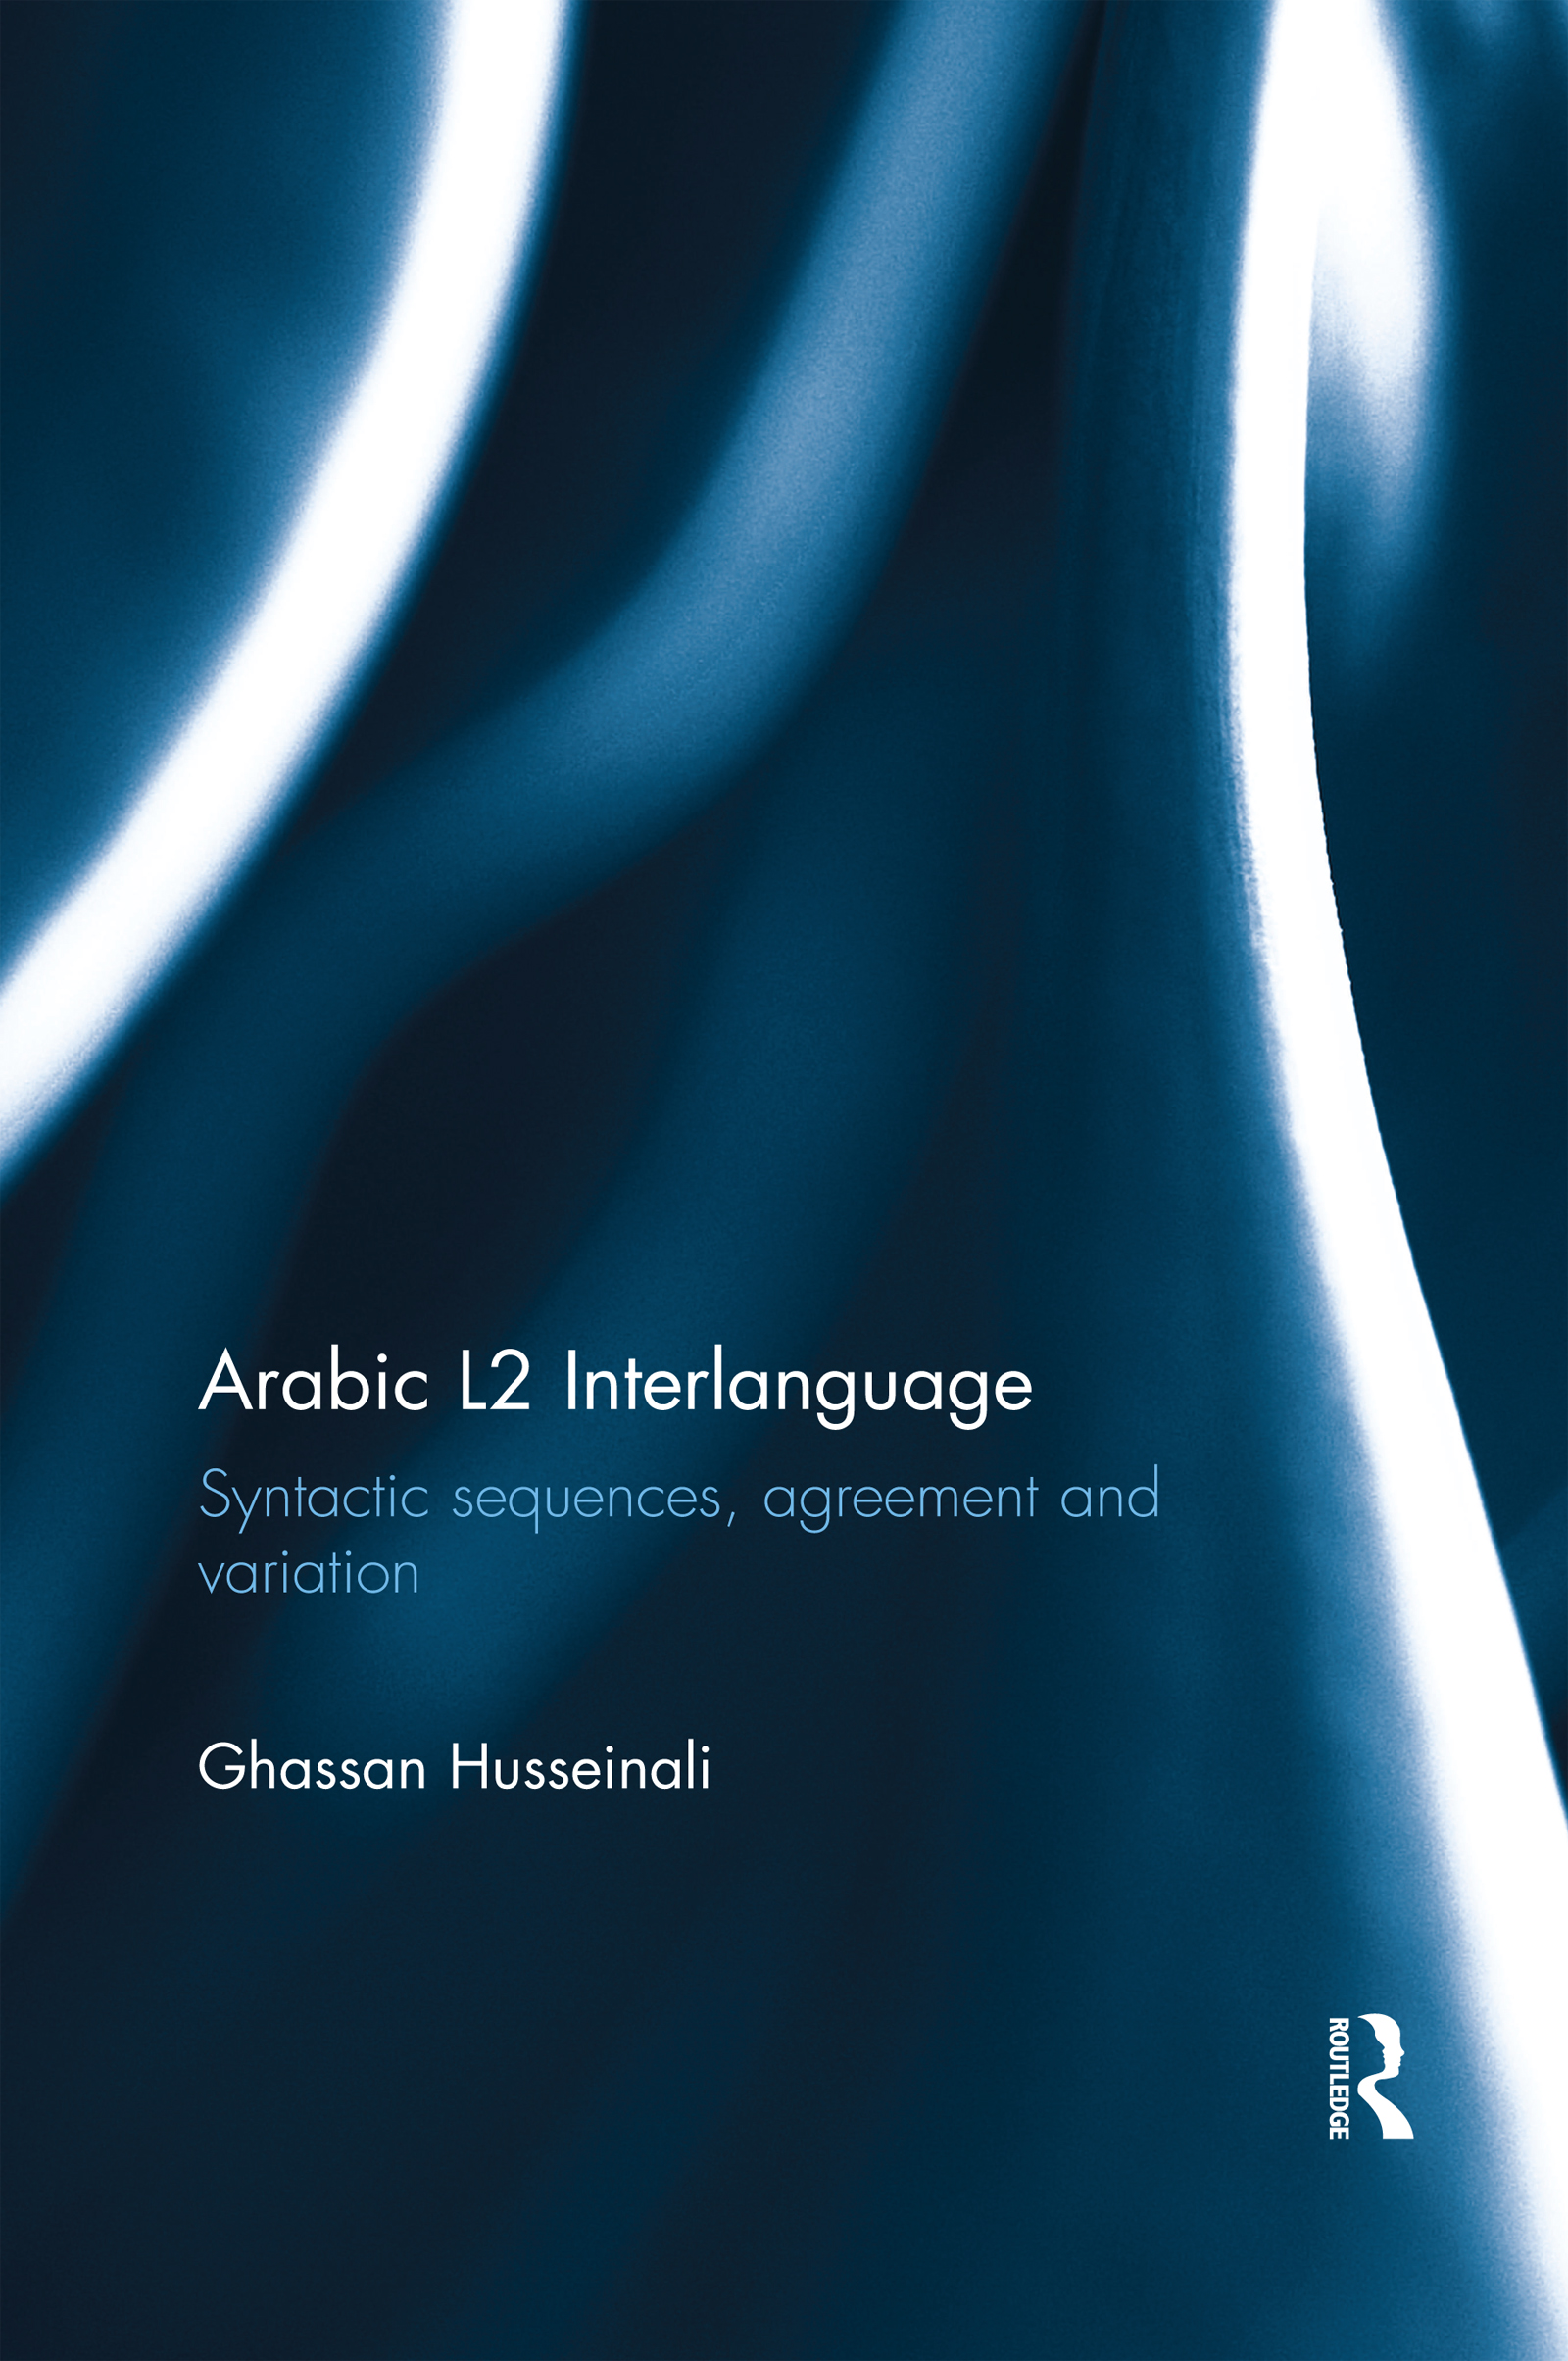 Arabic L2 Interlanguage